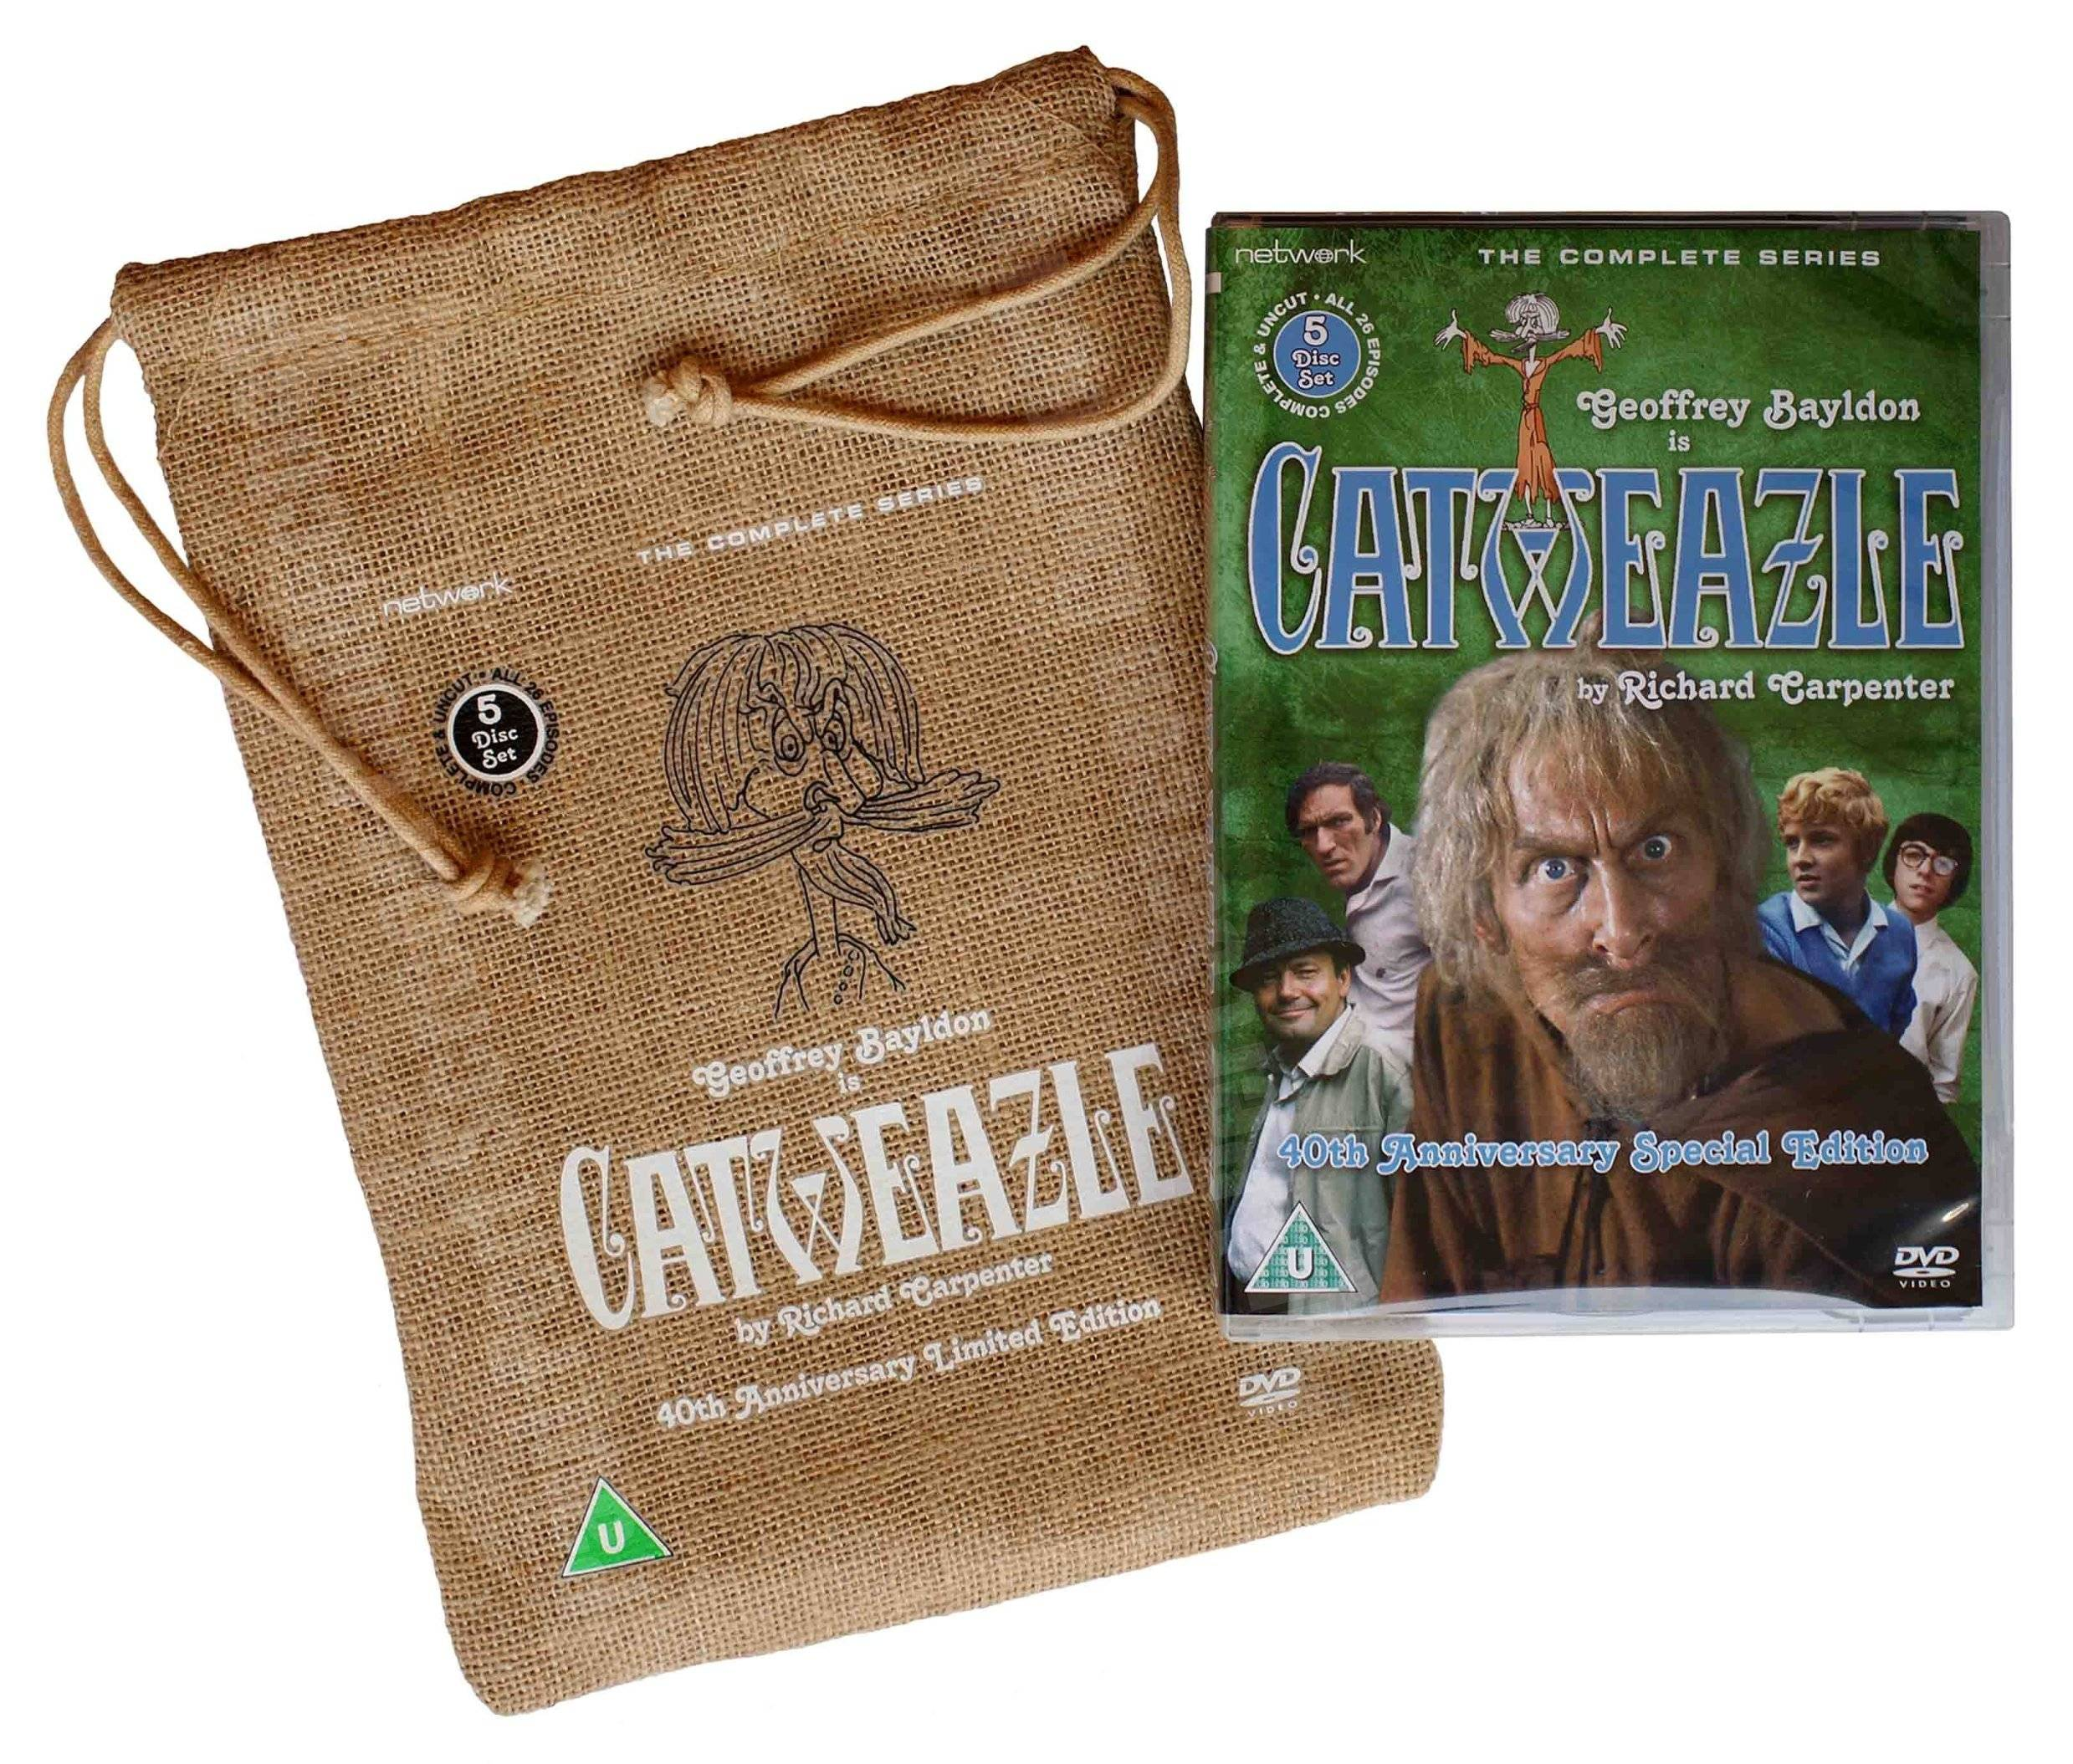 Catweazle 40th Anniversary Commemorative Set (UK reg. 2 release)